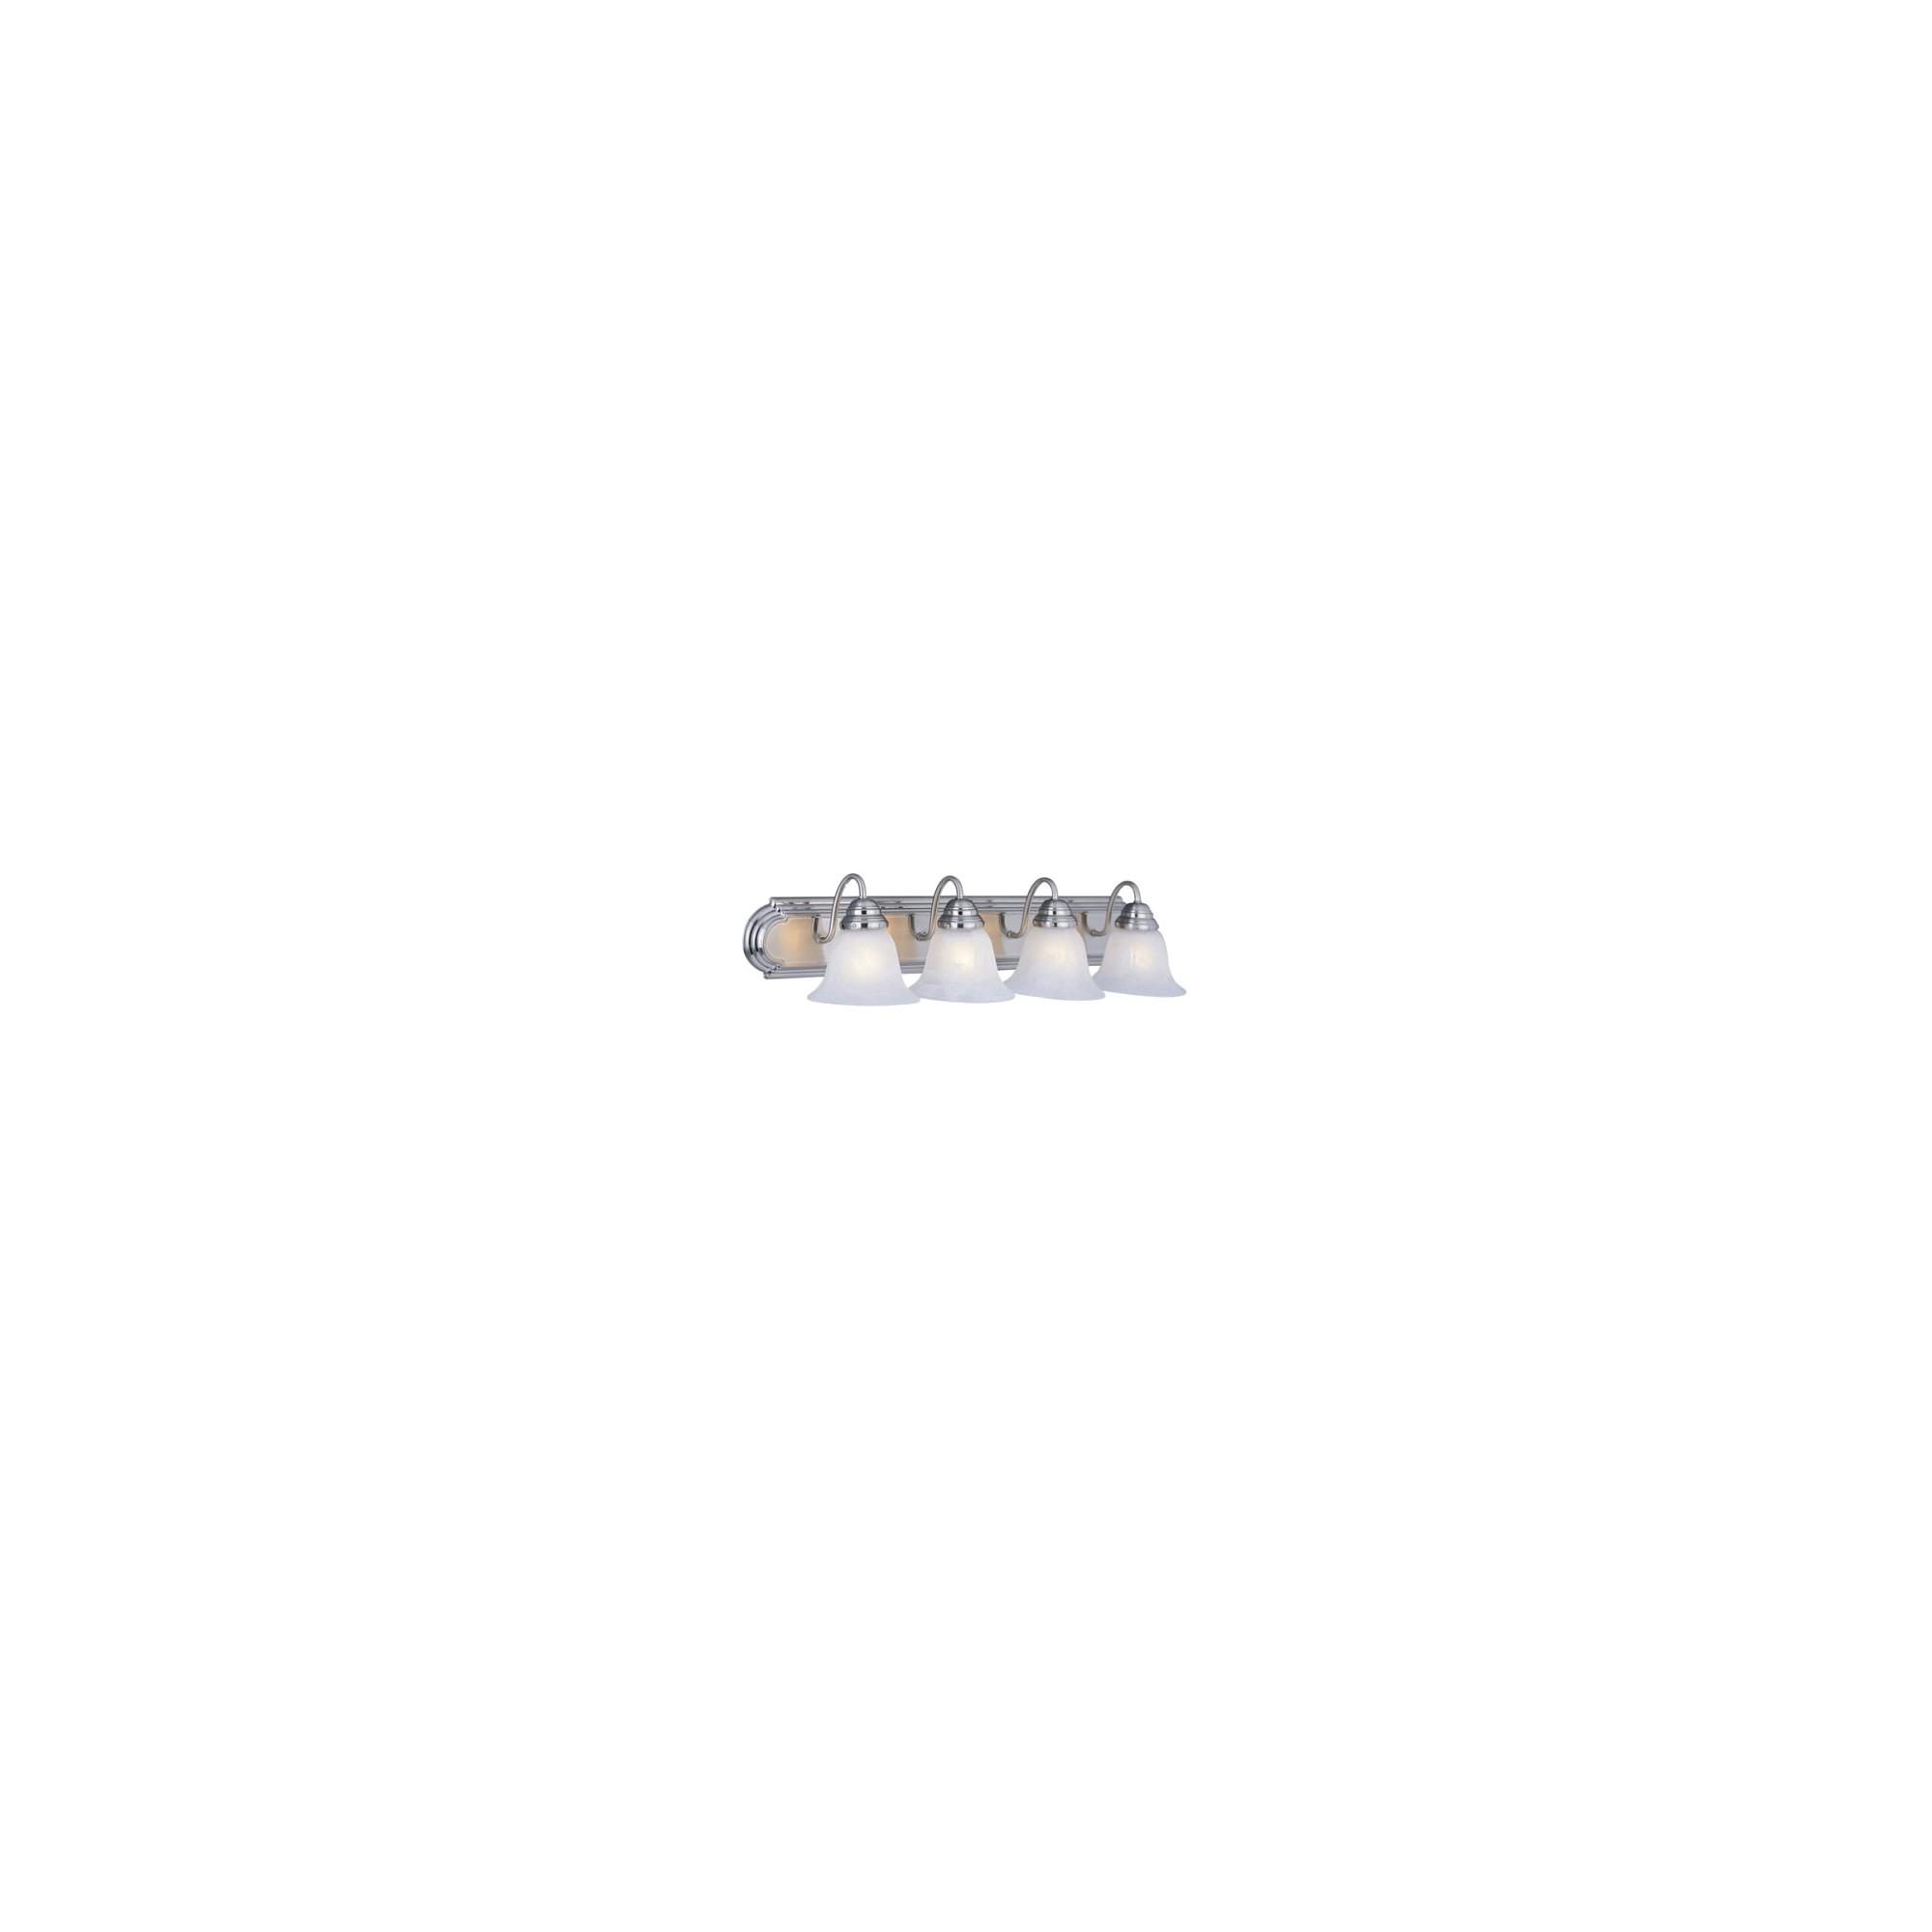 4-Light Vanity Fixture, wall lights